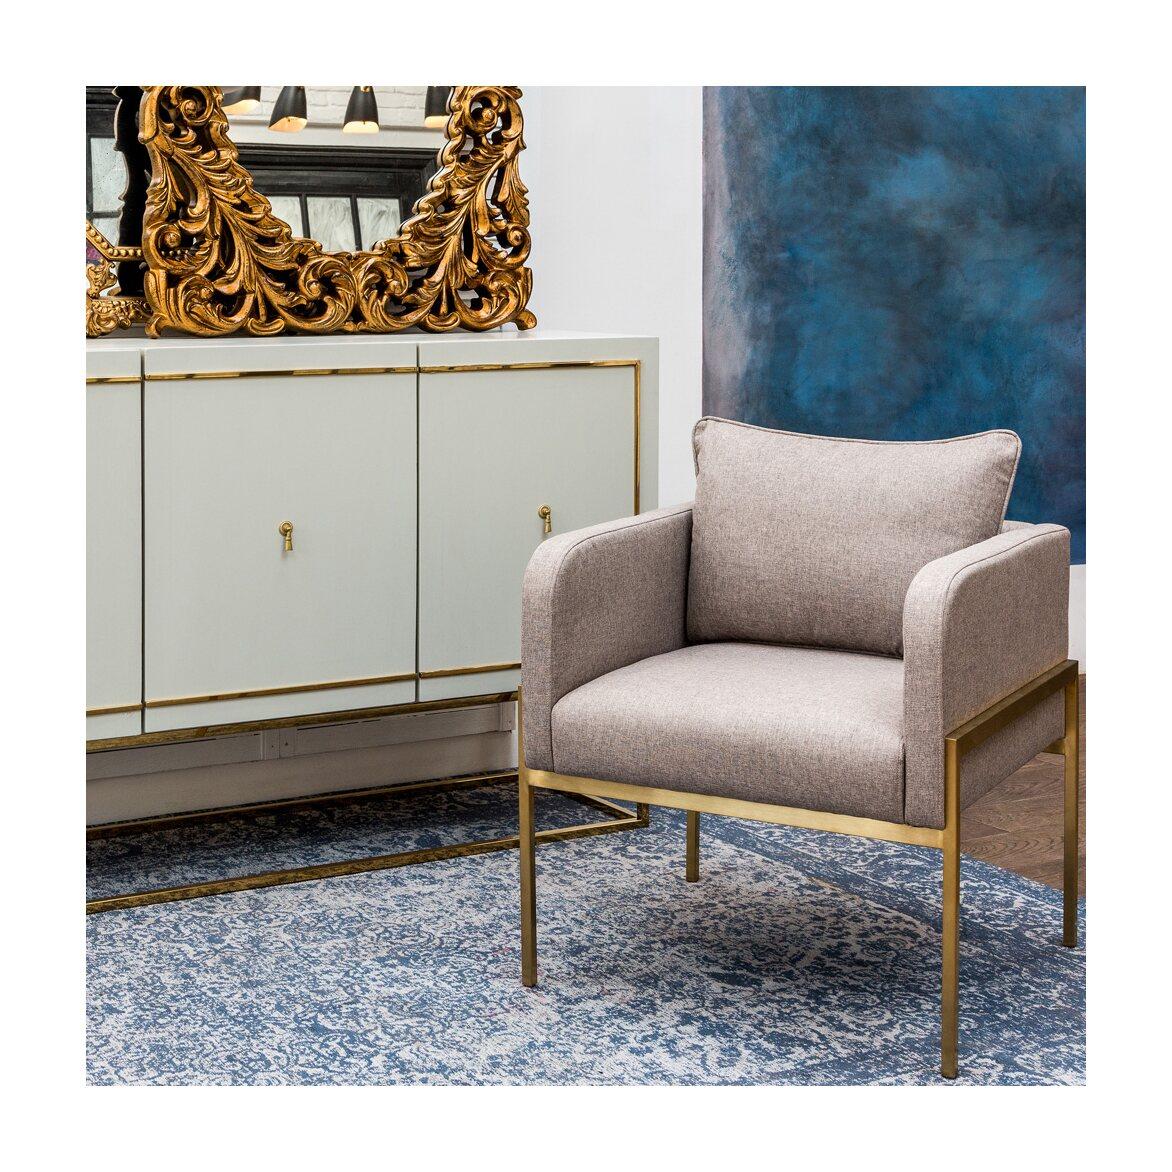 Кресло «Легато / Грэй» 5 | Кресло-стул Kingsby